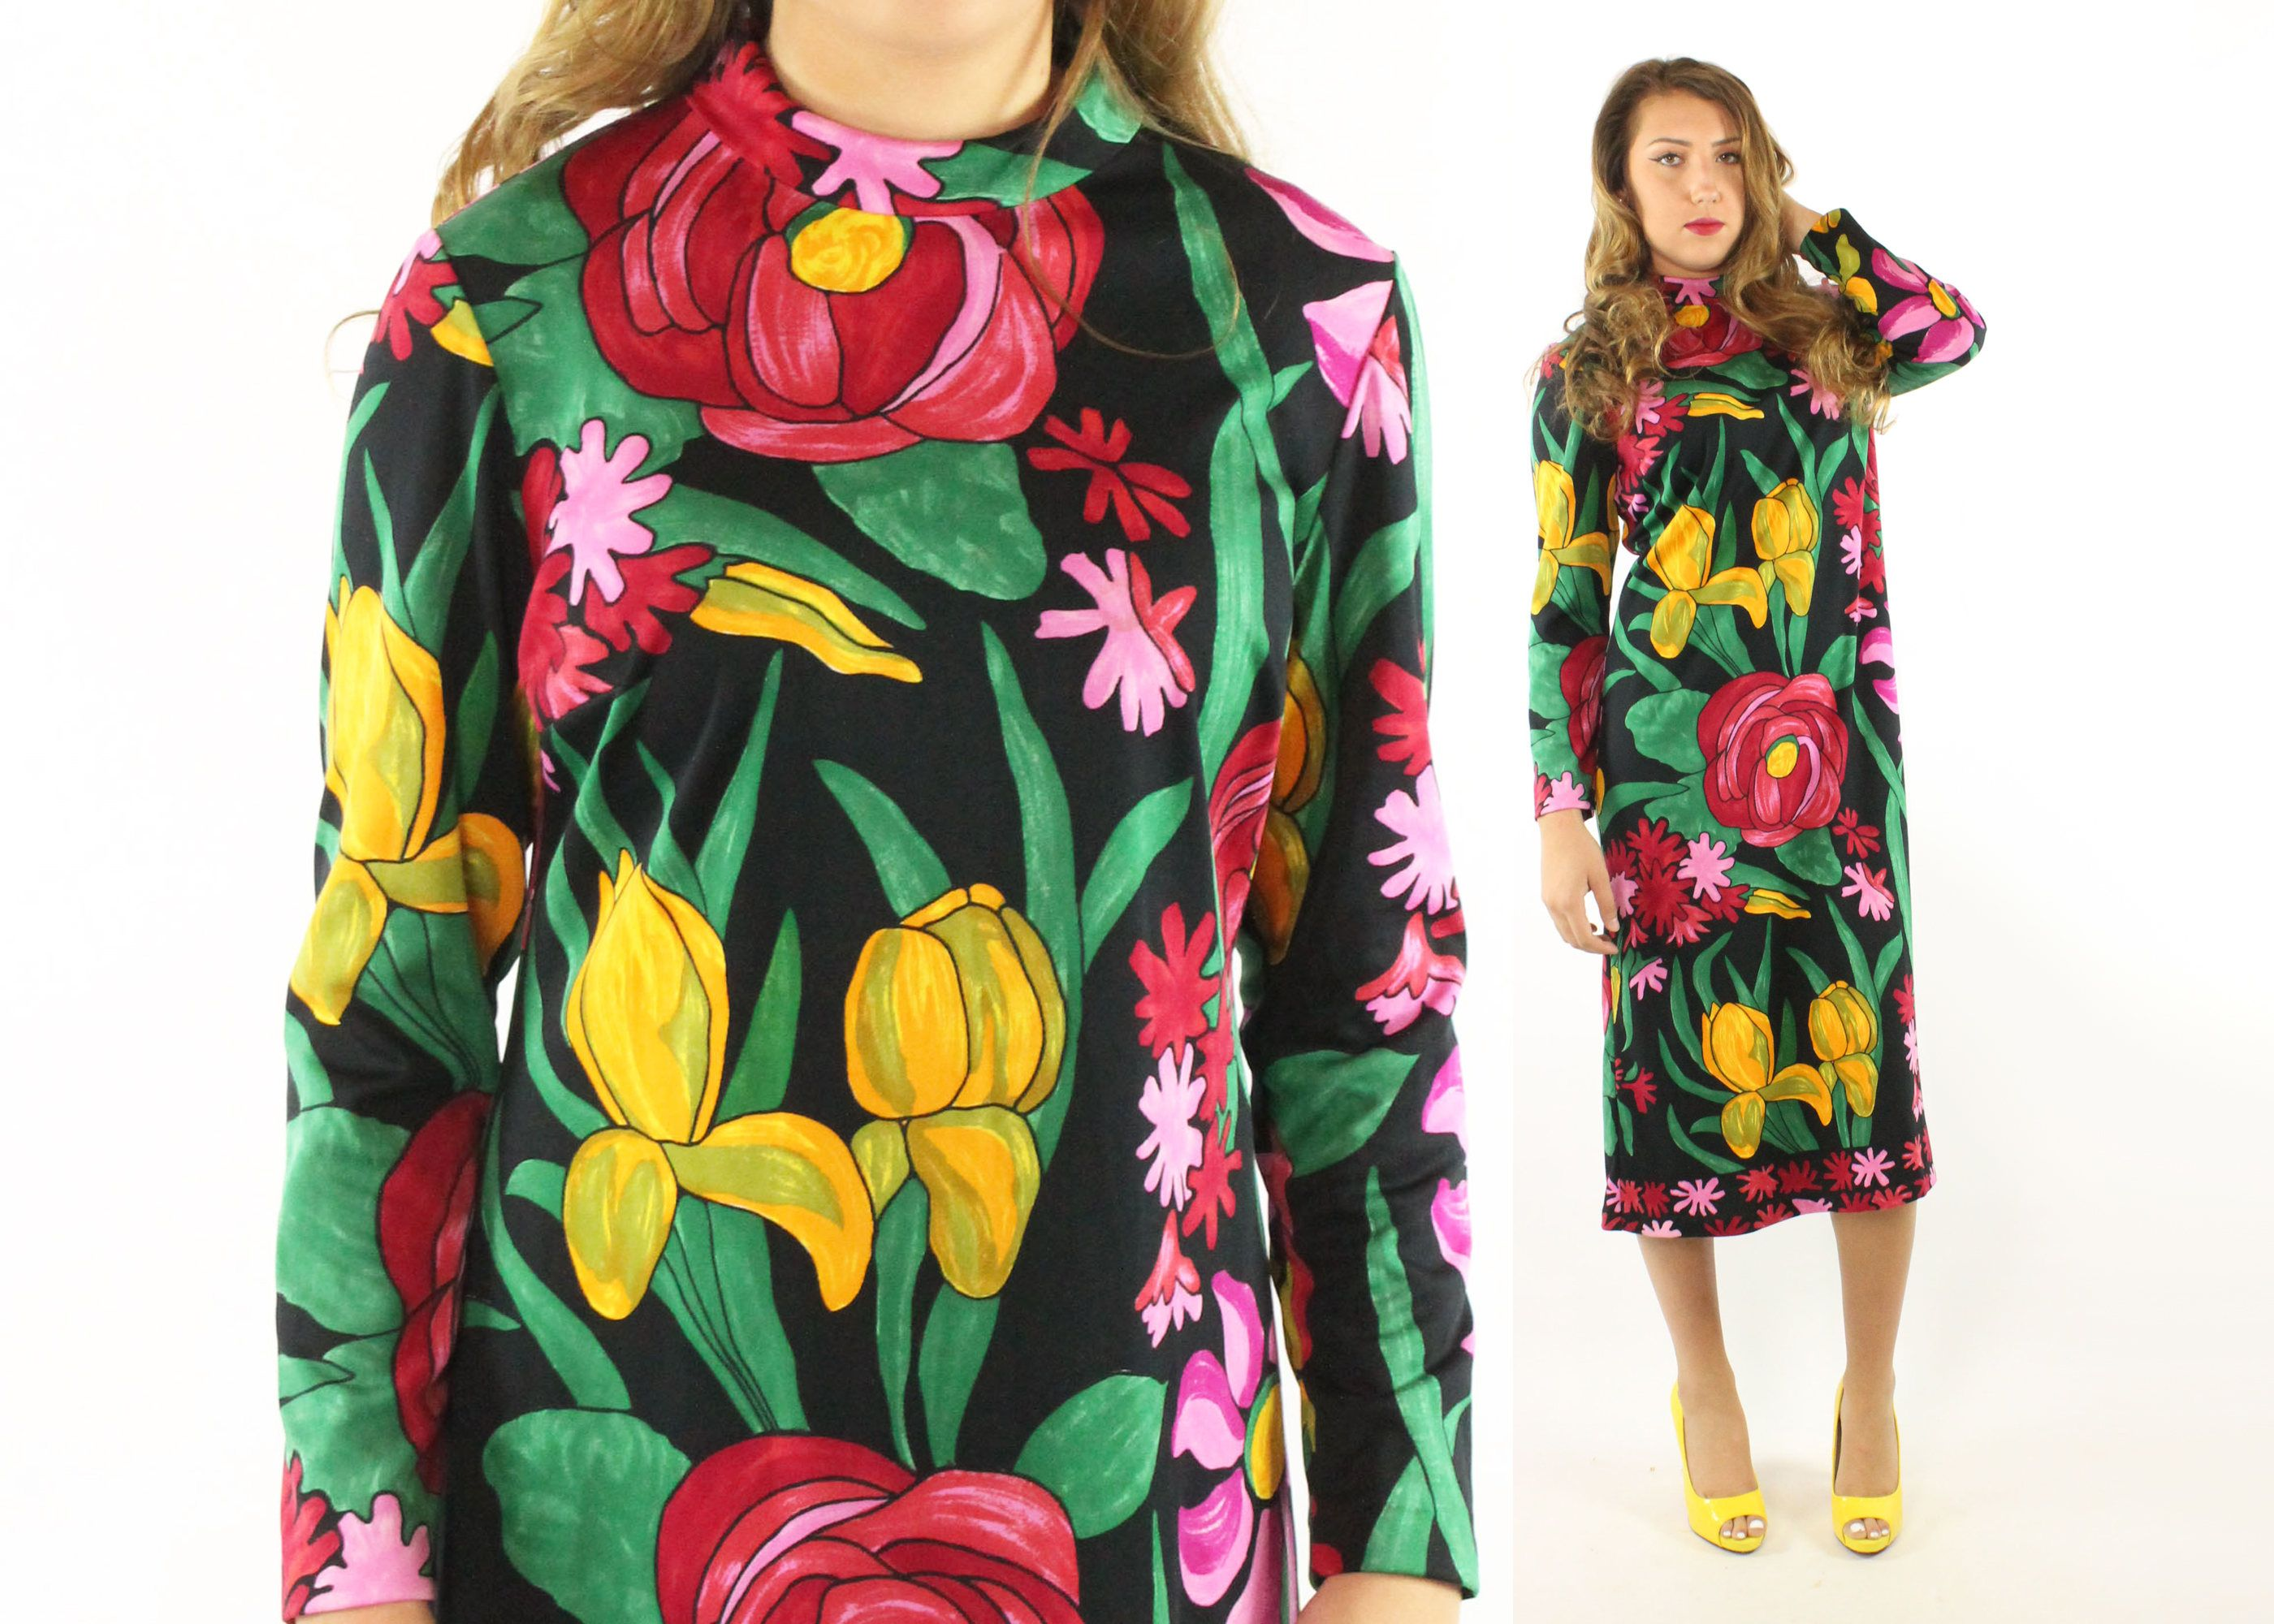 Reserved Please Do Not Buy Vintage 70s Saul Villa Dress Floral Etsy Long Sleeve Shift Dress Shift Dress Black Black Knit [ 2000 x 2800 Pixel ]